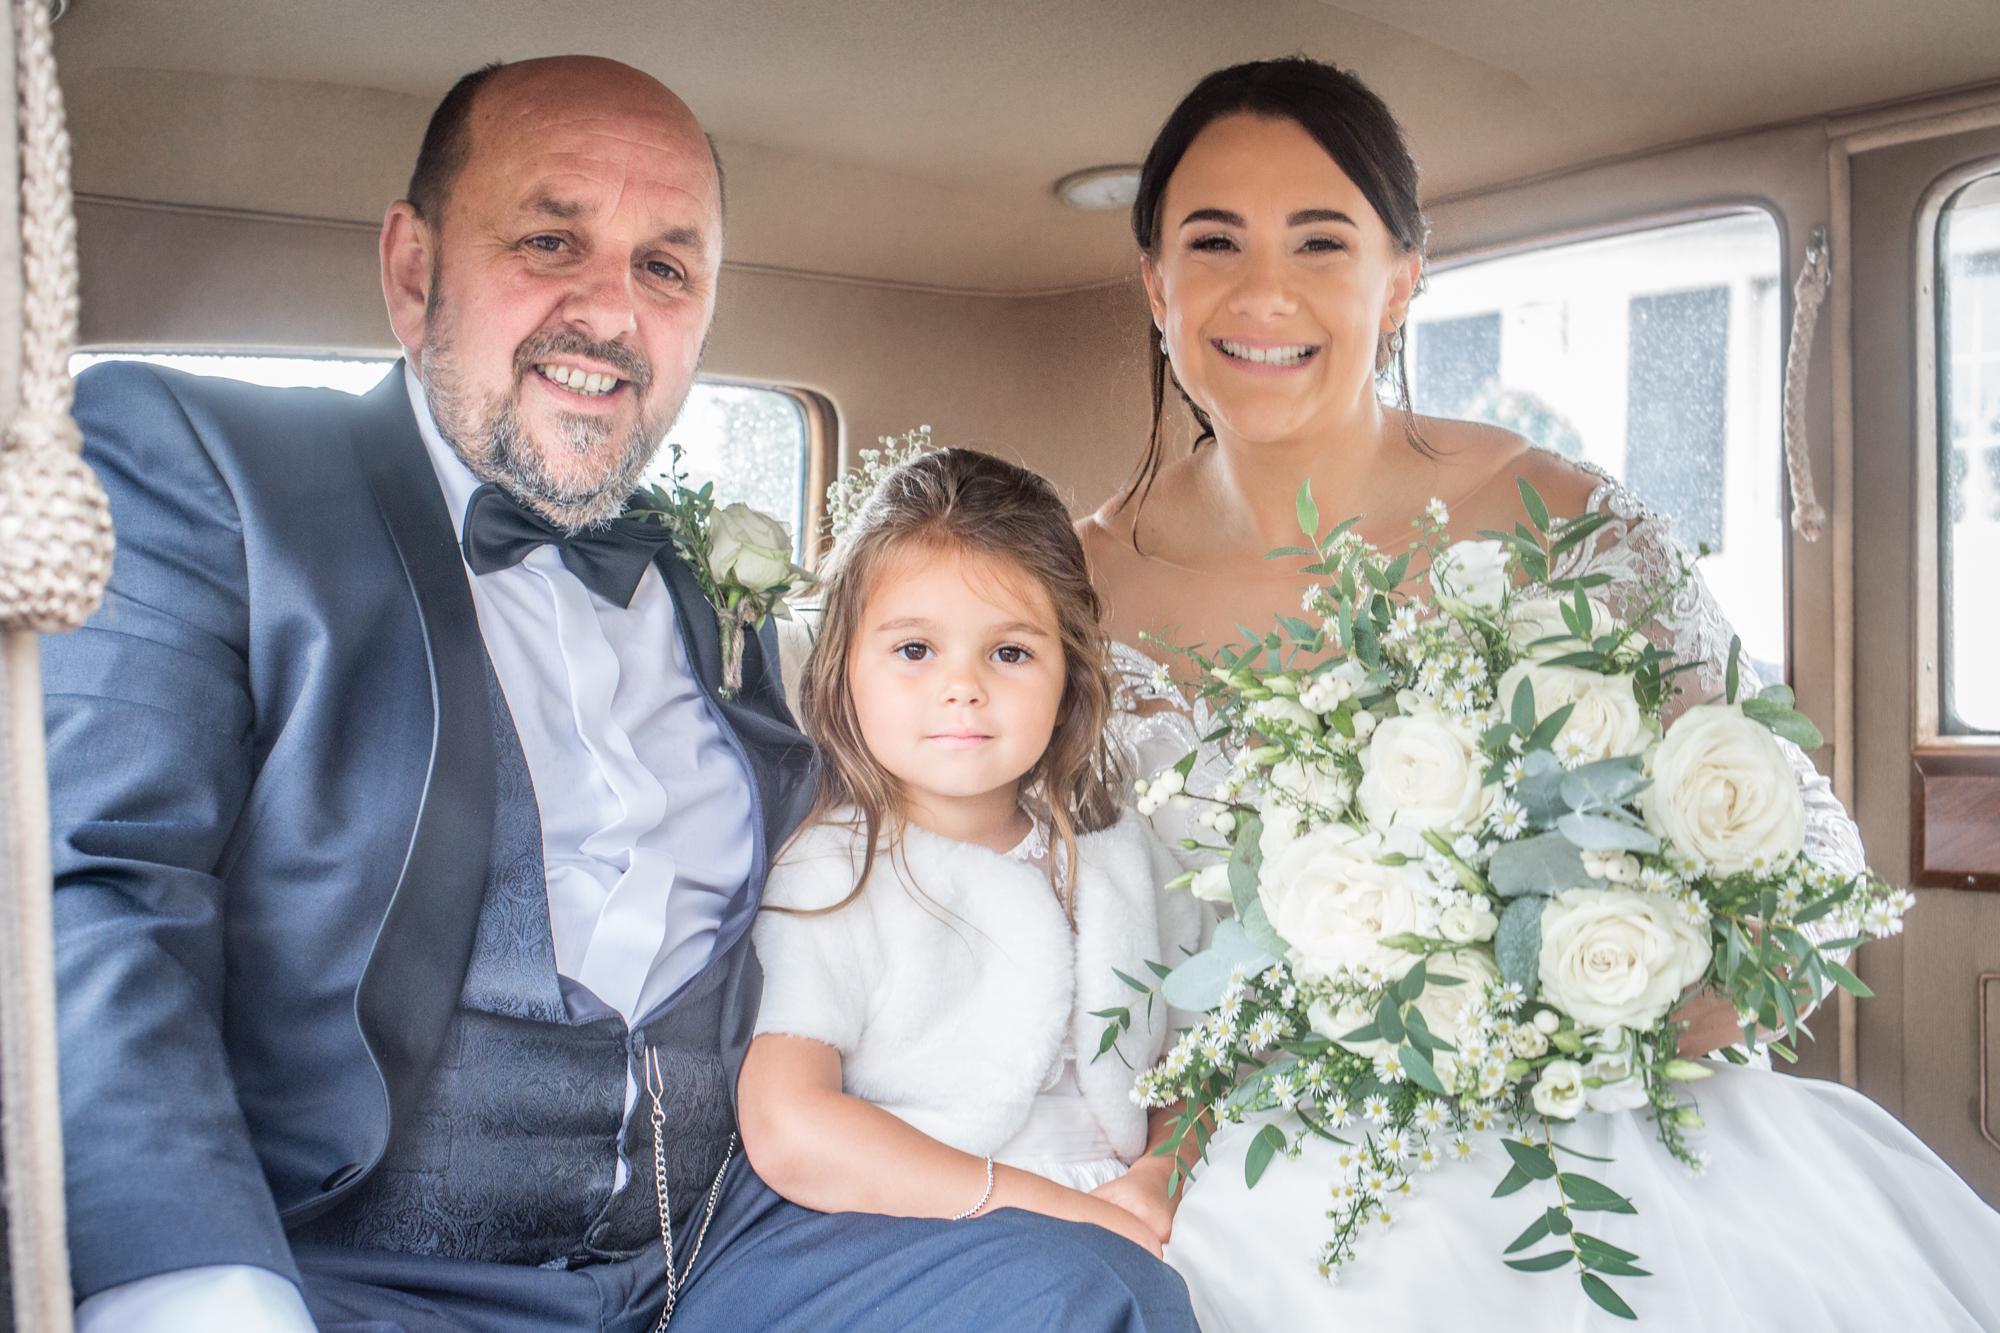 Wedding Car and Church Photography in Llanelli